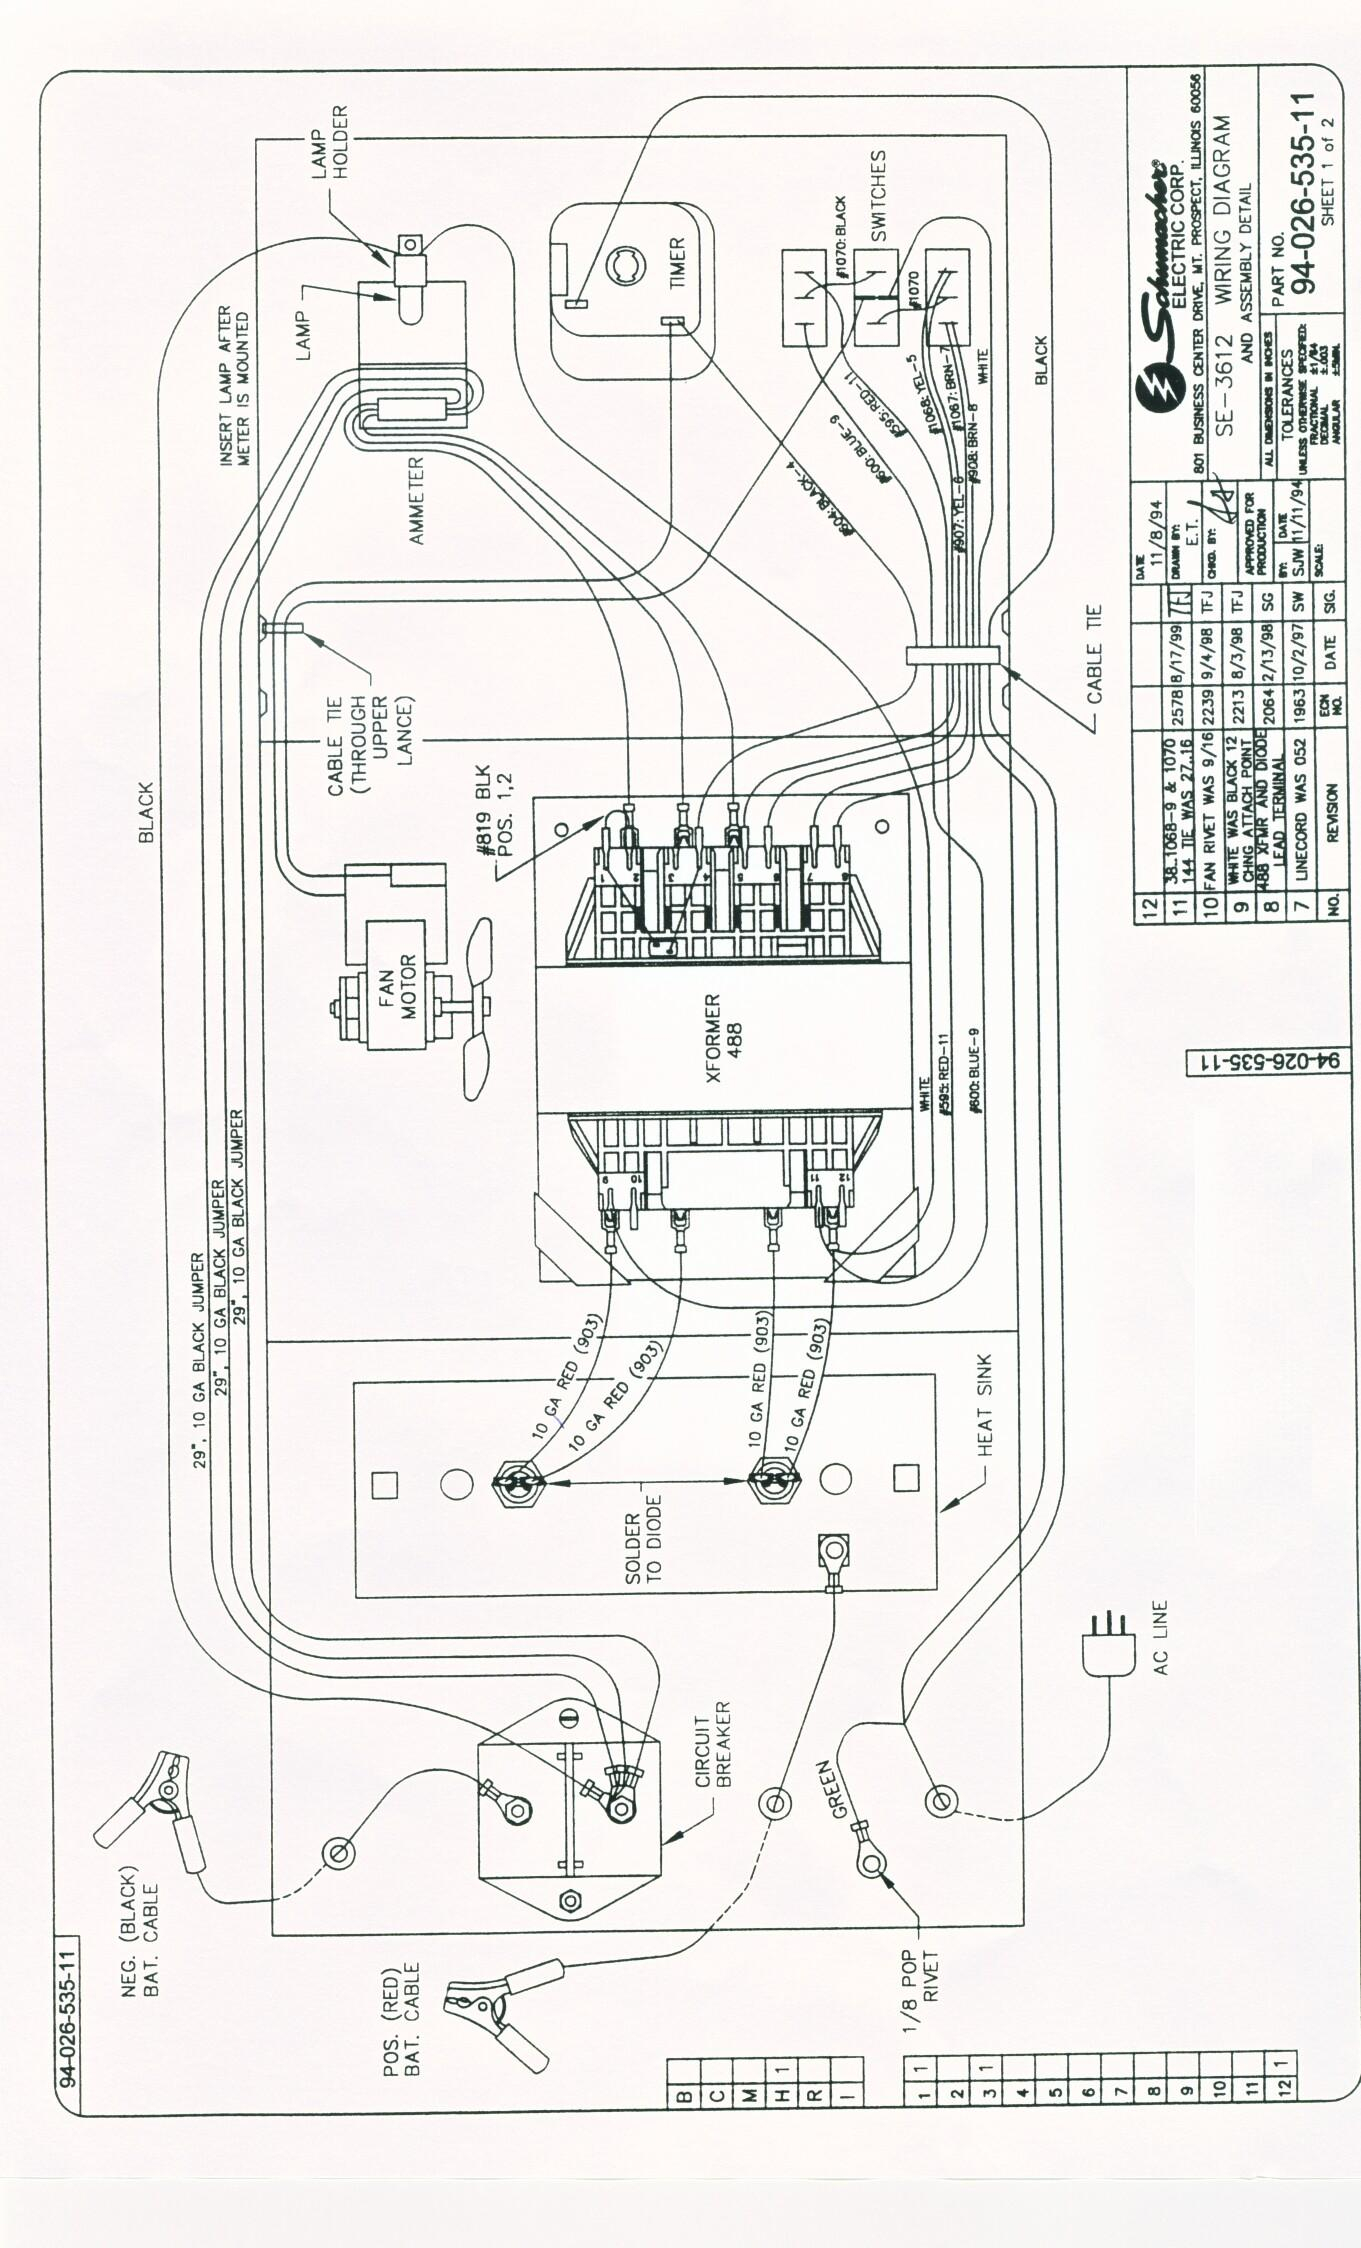 hight resolution of schumacher battery charger se 82 6 wiring diagram collection schumacher se 5212a wiring diagram new download wiring diagram